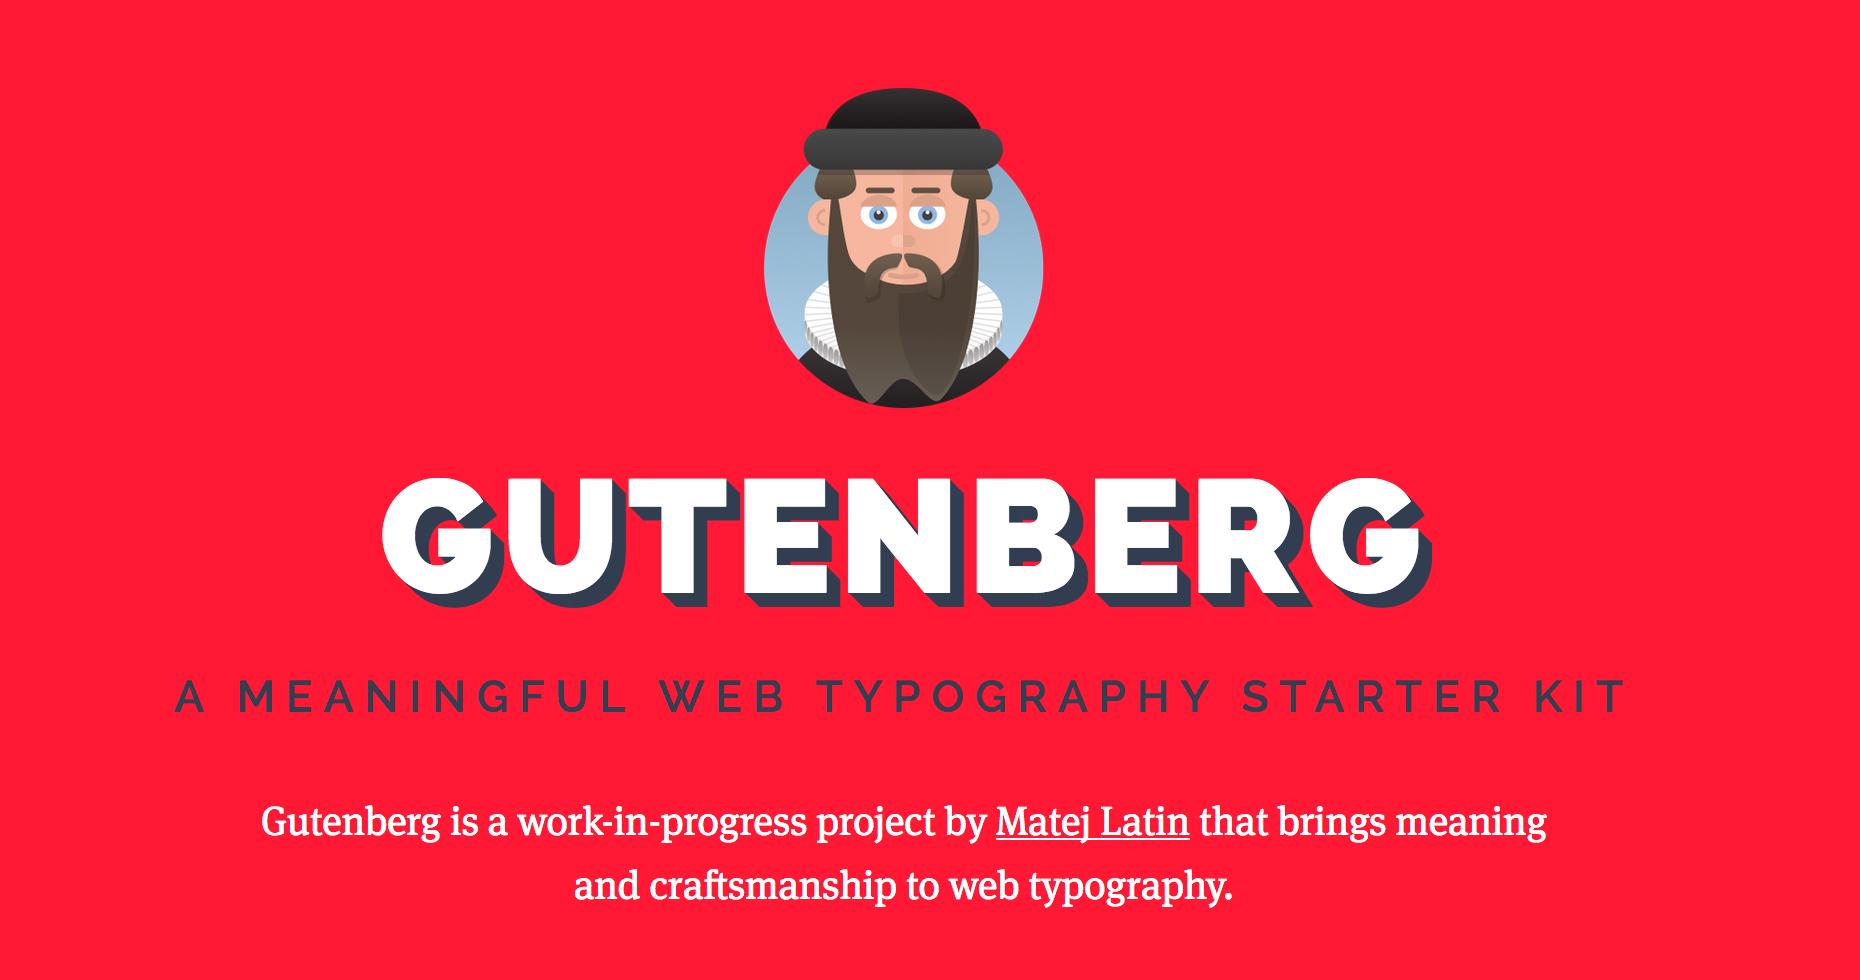 Gutemberg website